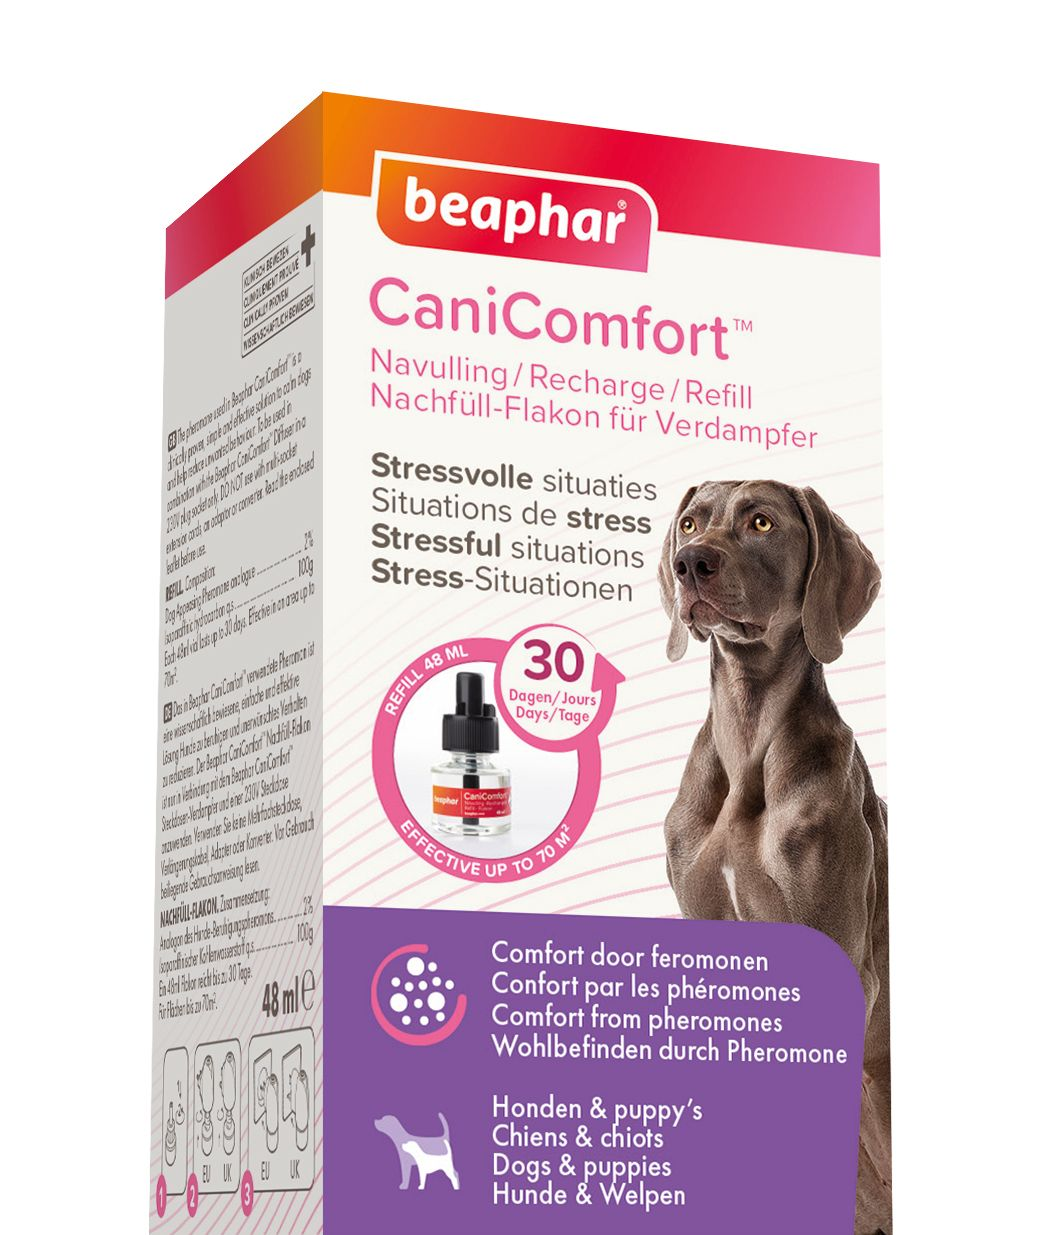 Beaphar CaniComfort Diffuser 48ml Refil Hund